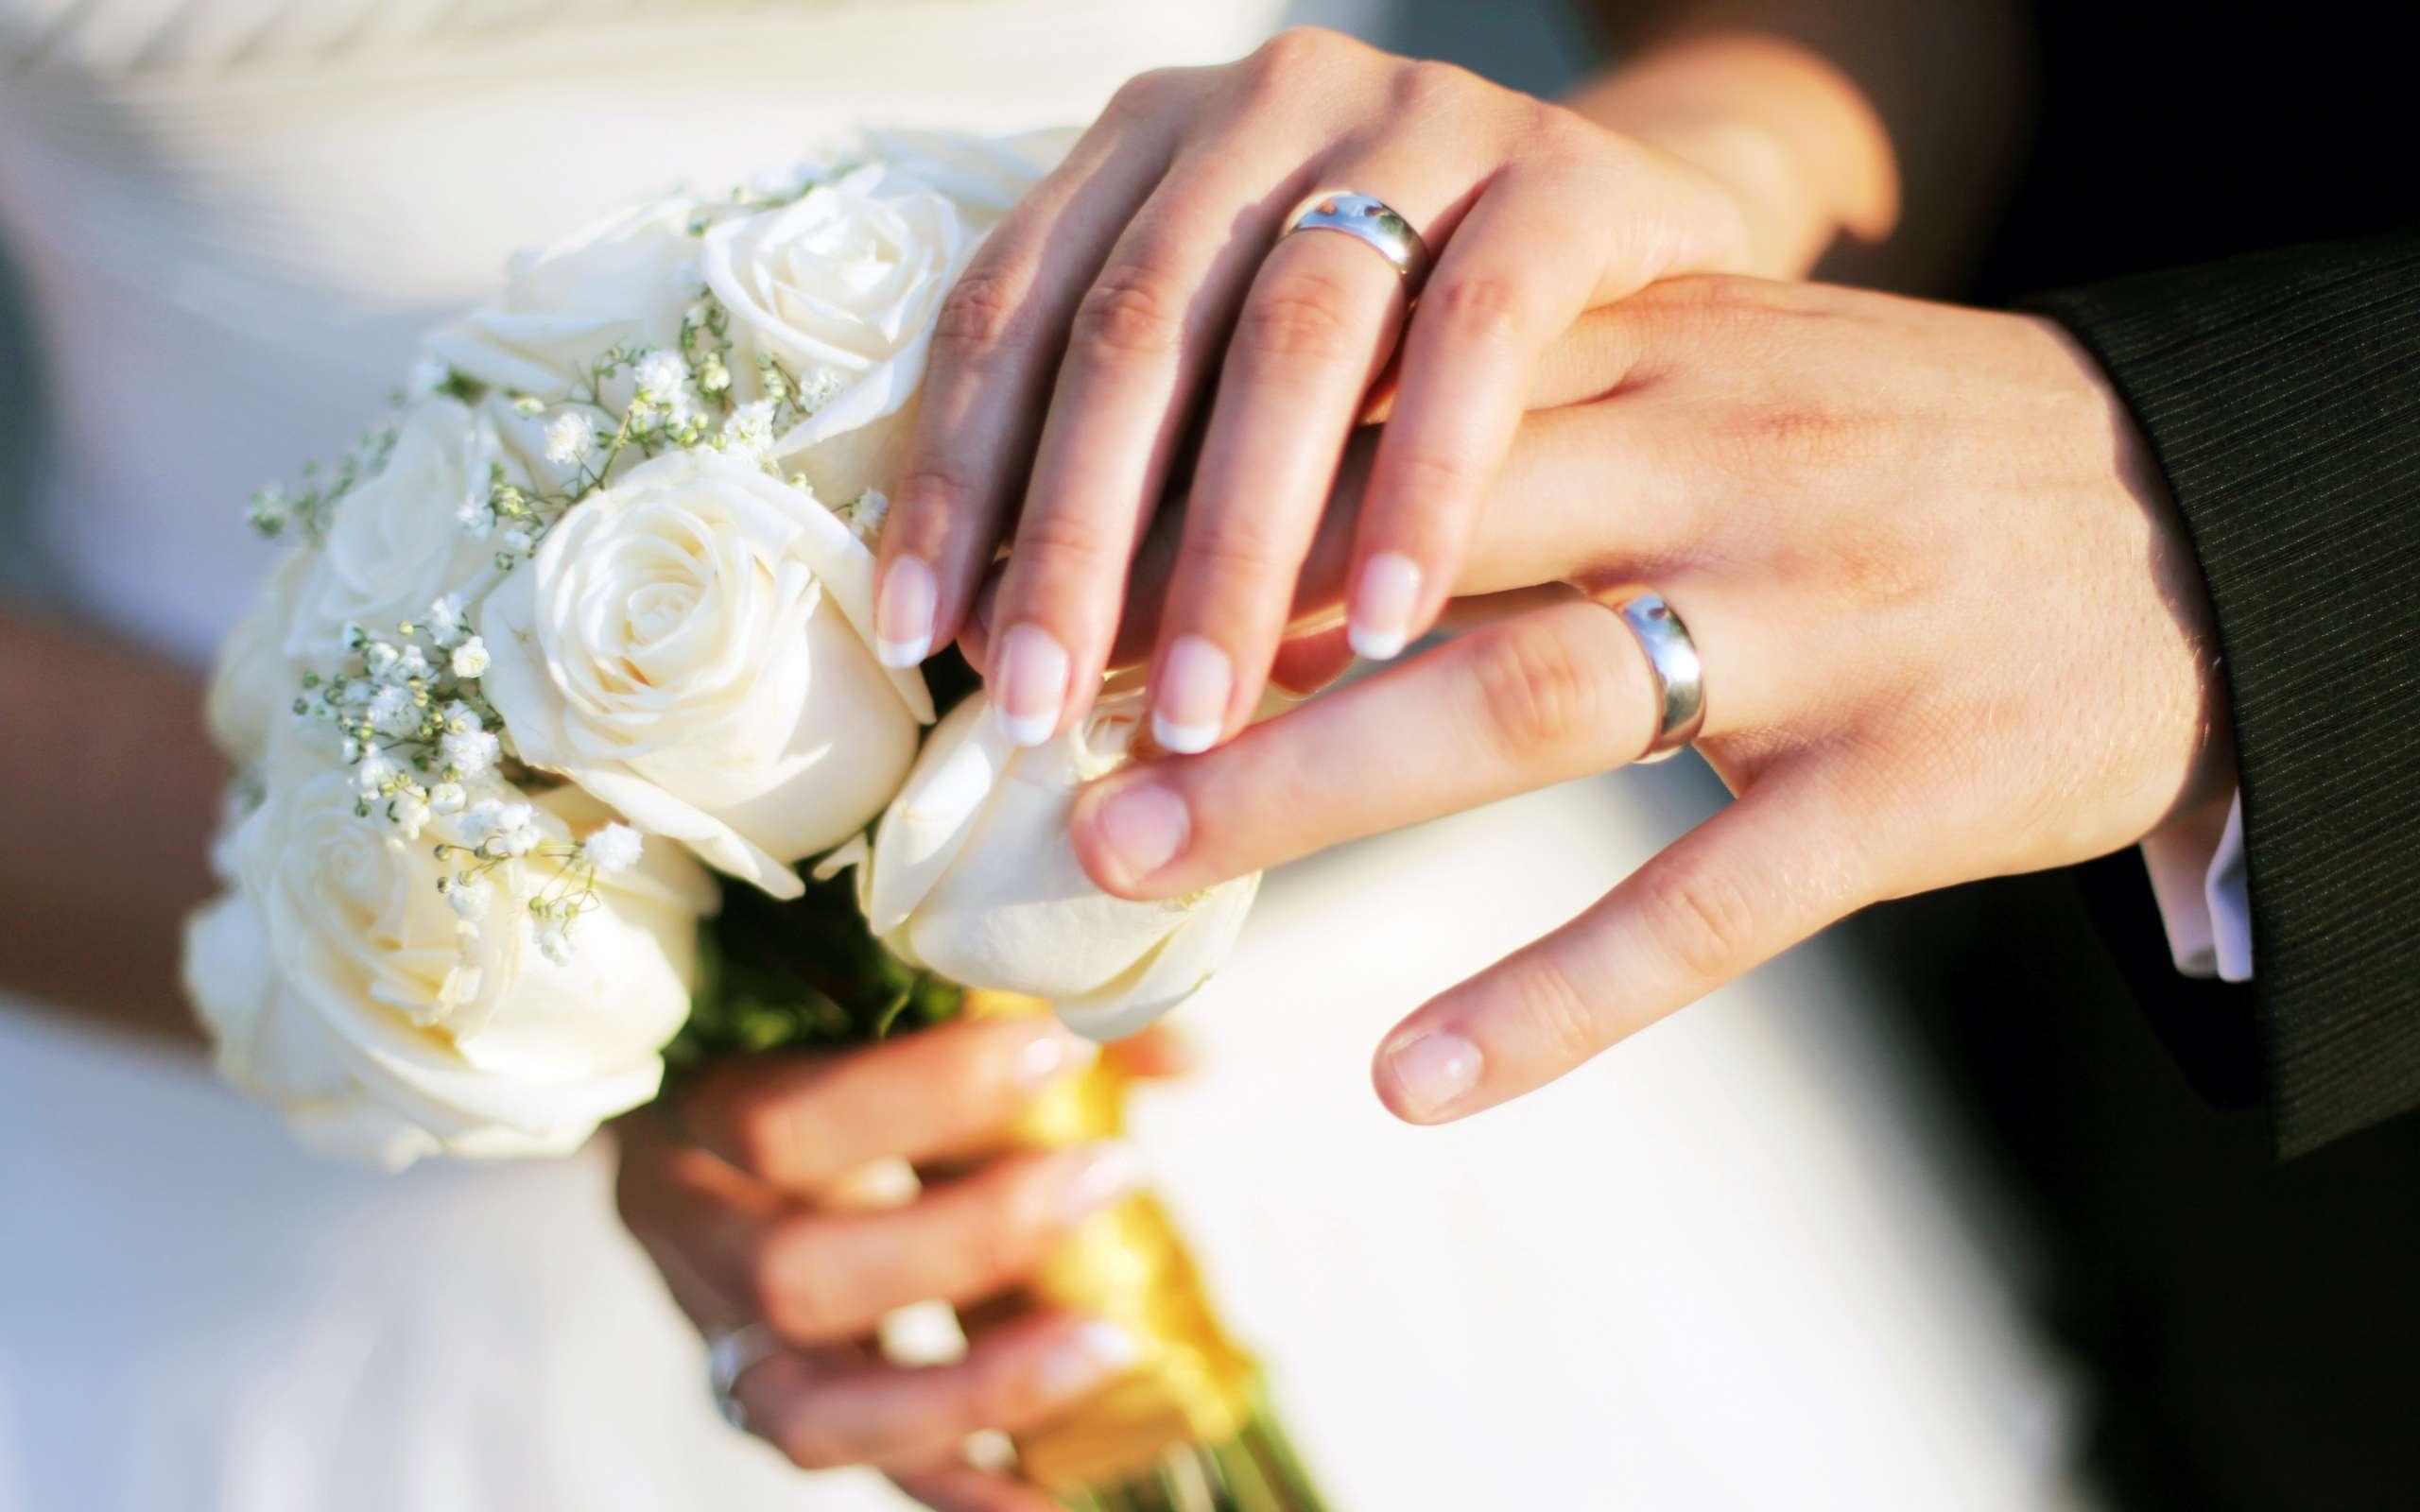 FqRSHvSoRsG07Sw9N2qK_bride-and-groom